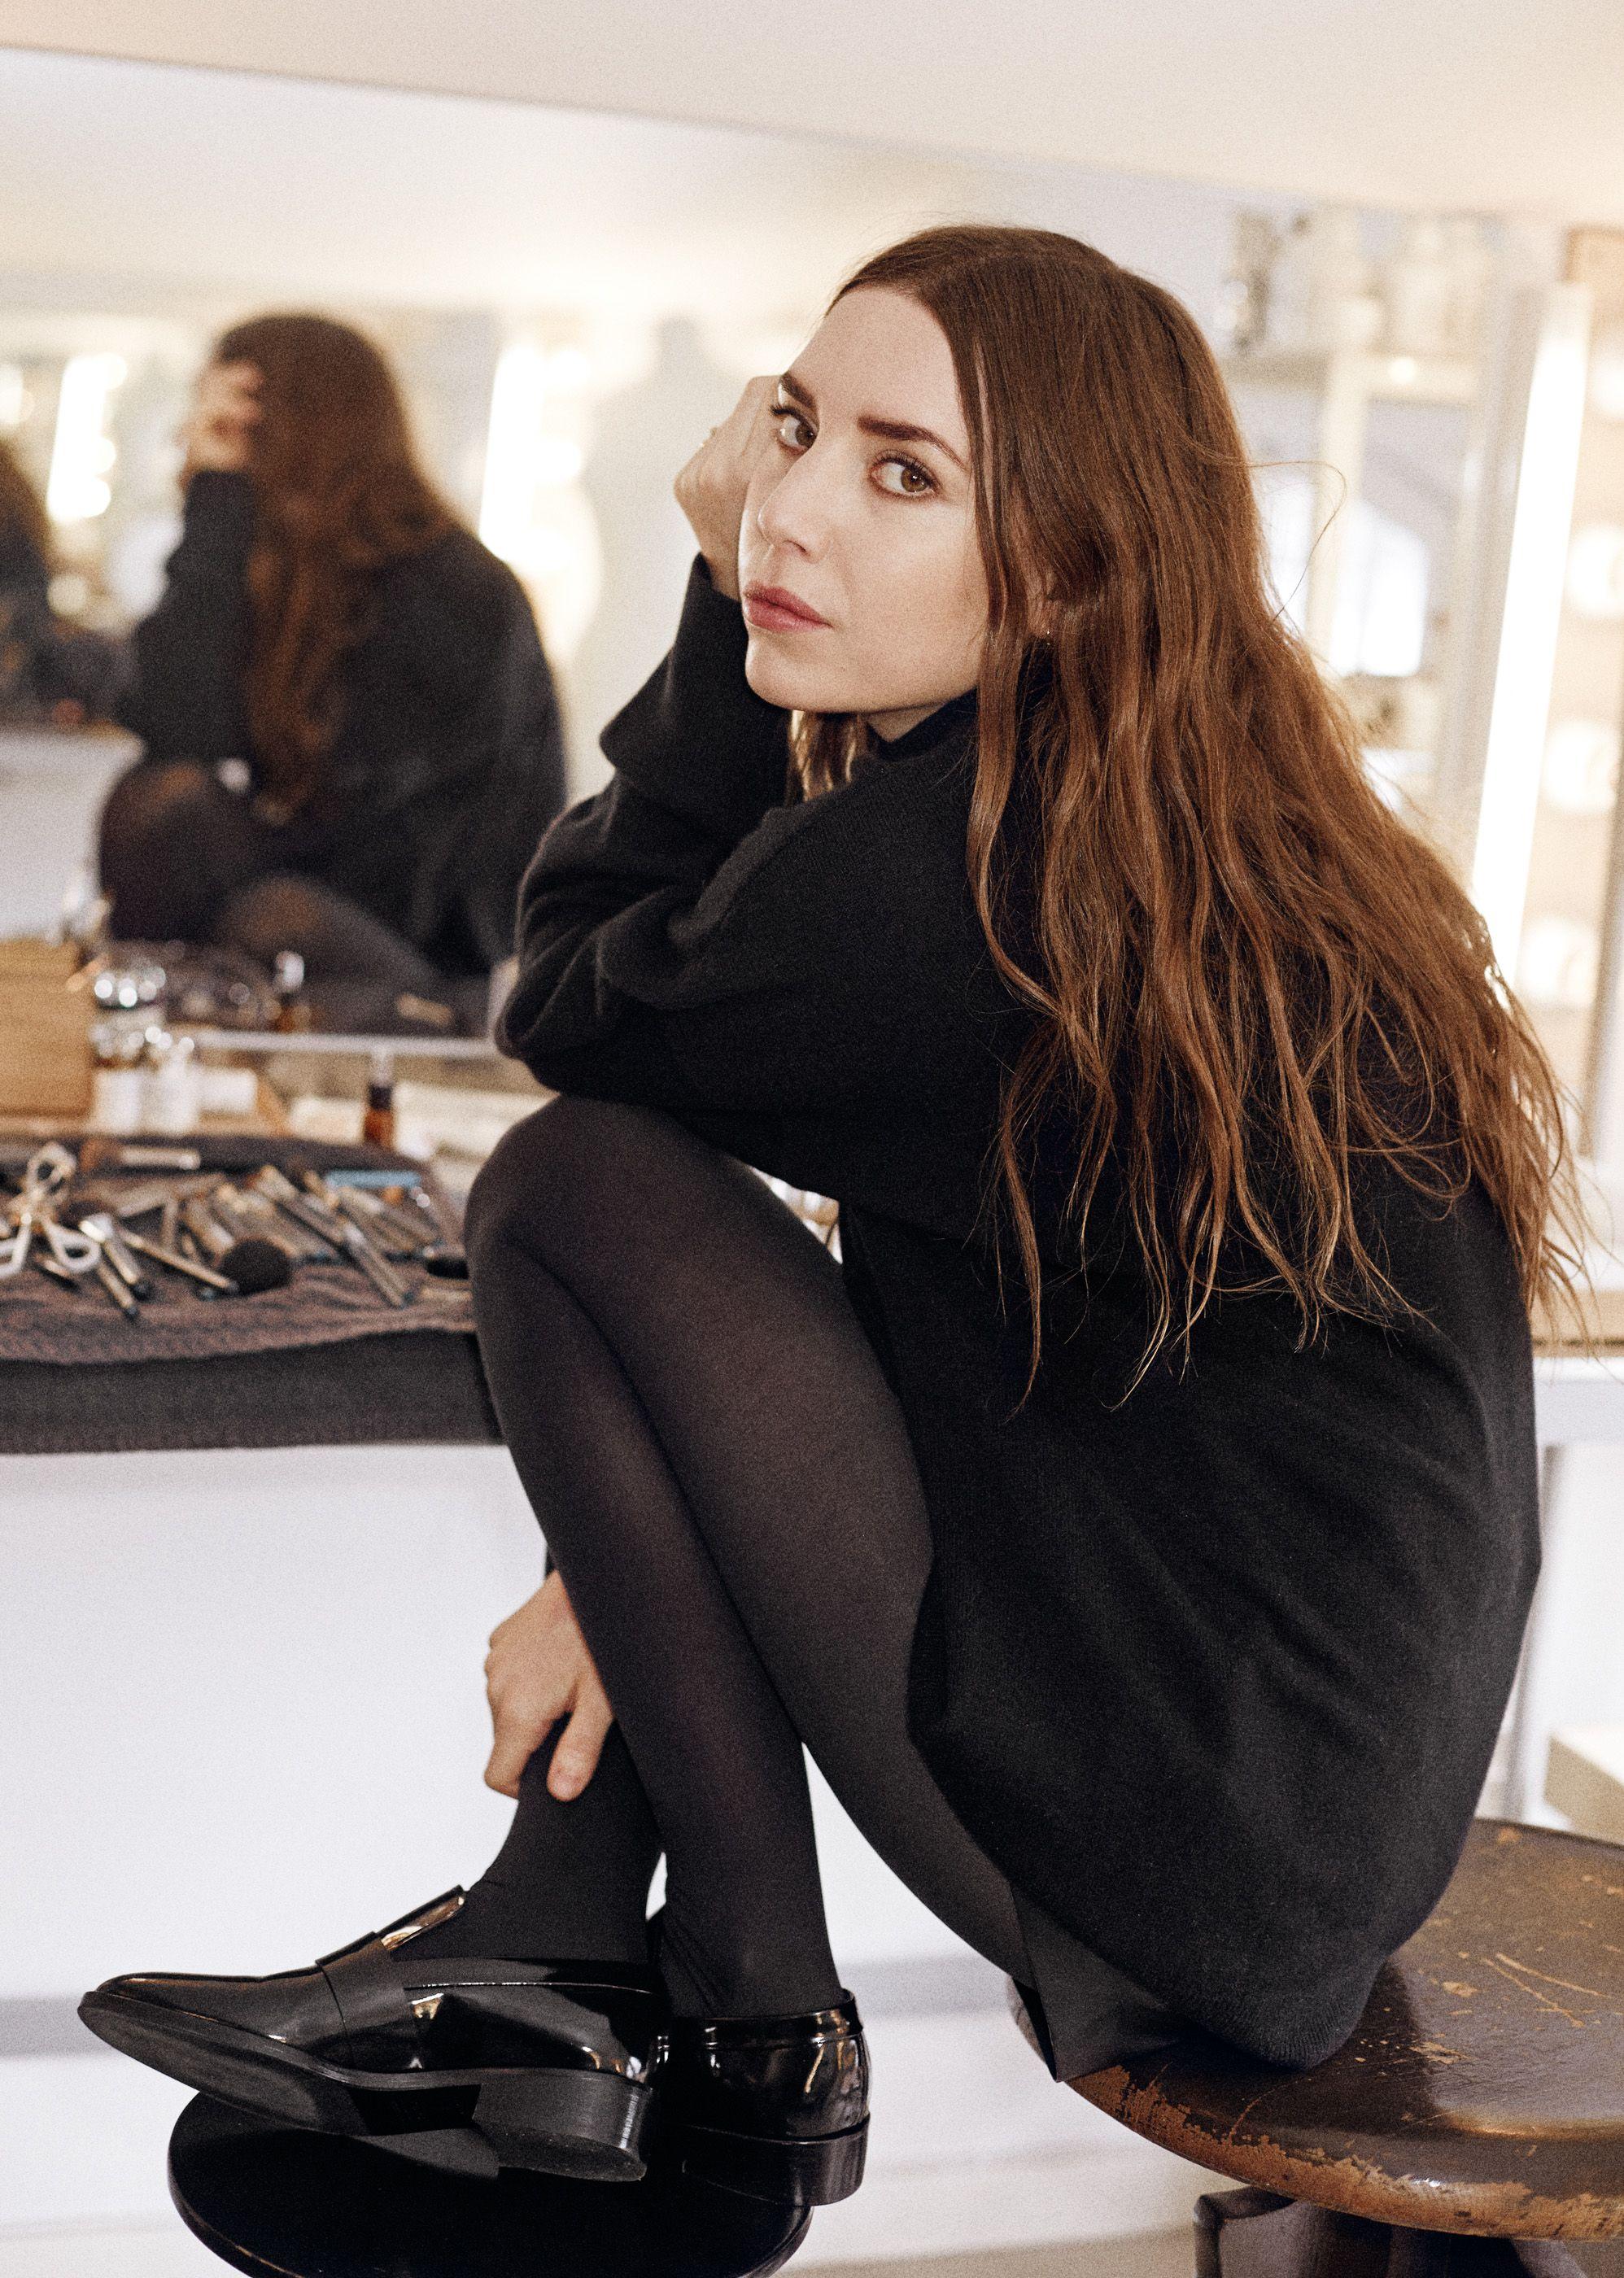 Other Stories Lykke Li Browse Through Lykke Li S Co Lab Collection Of Iconic Pieces Fashion Lykke Li Style